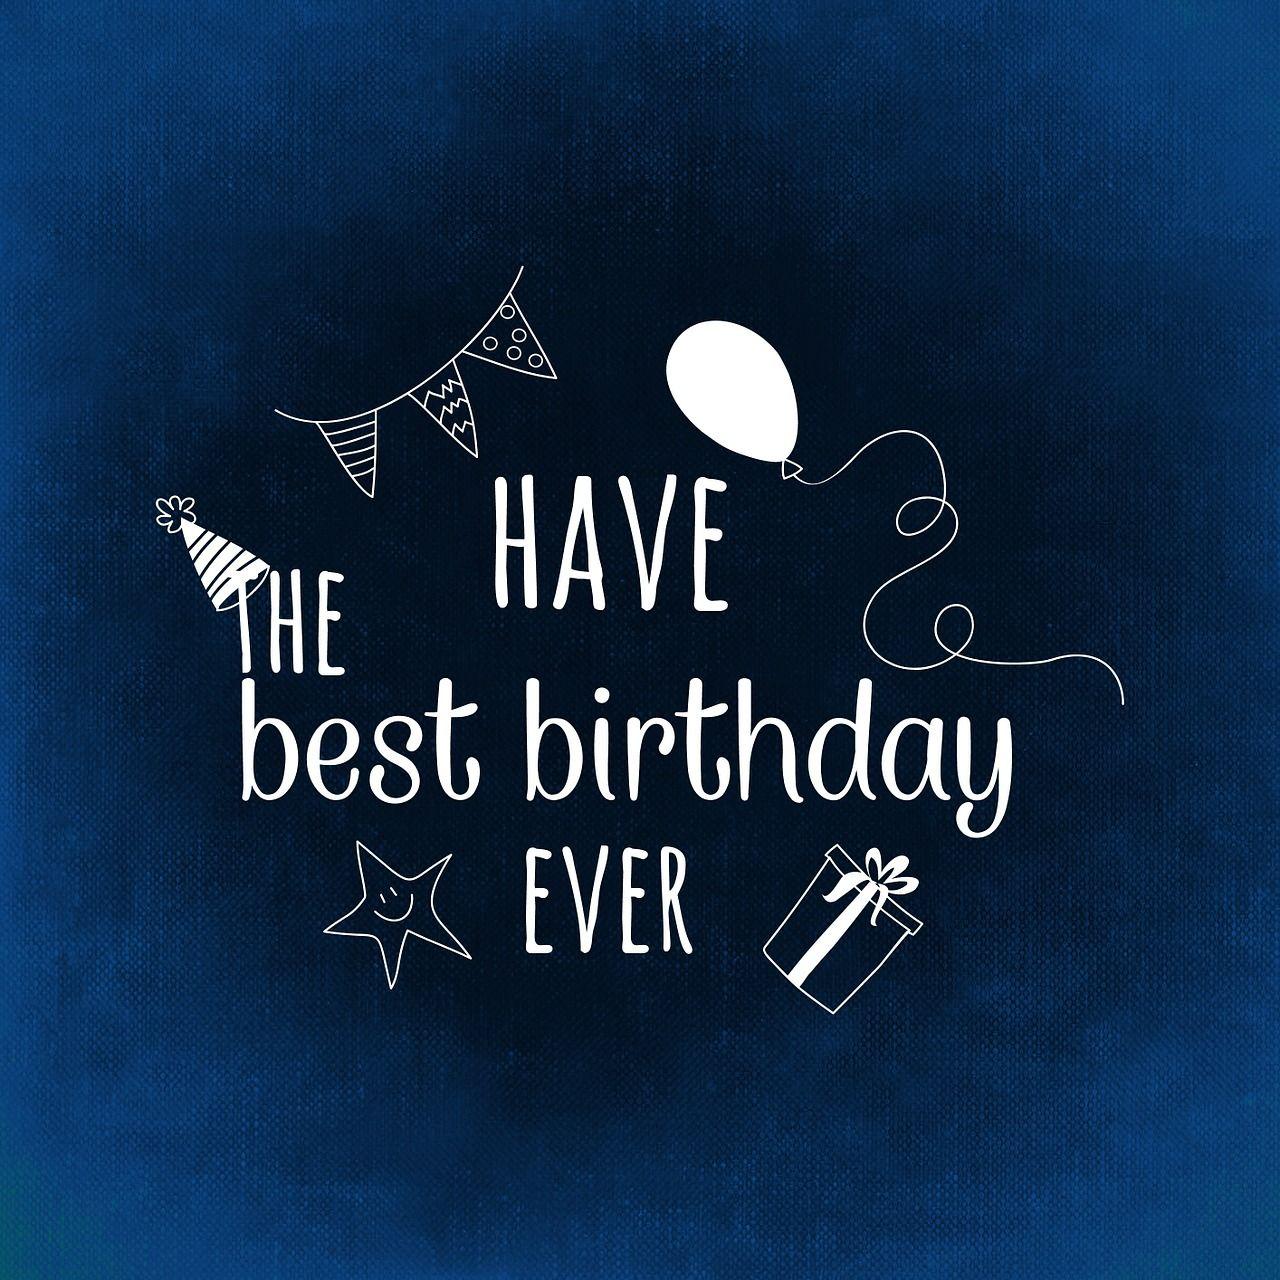 happy-birthday-813180_1280